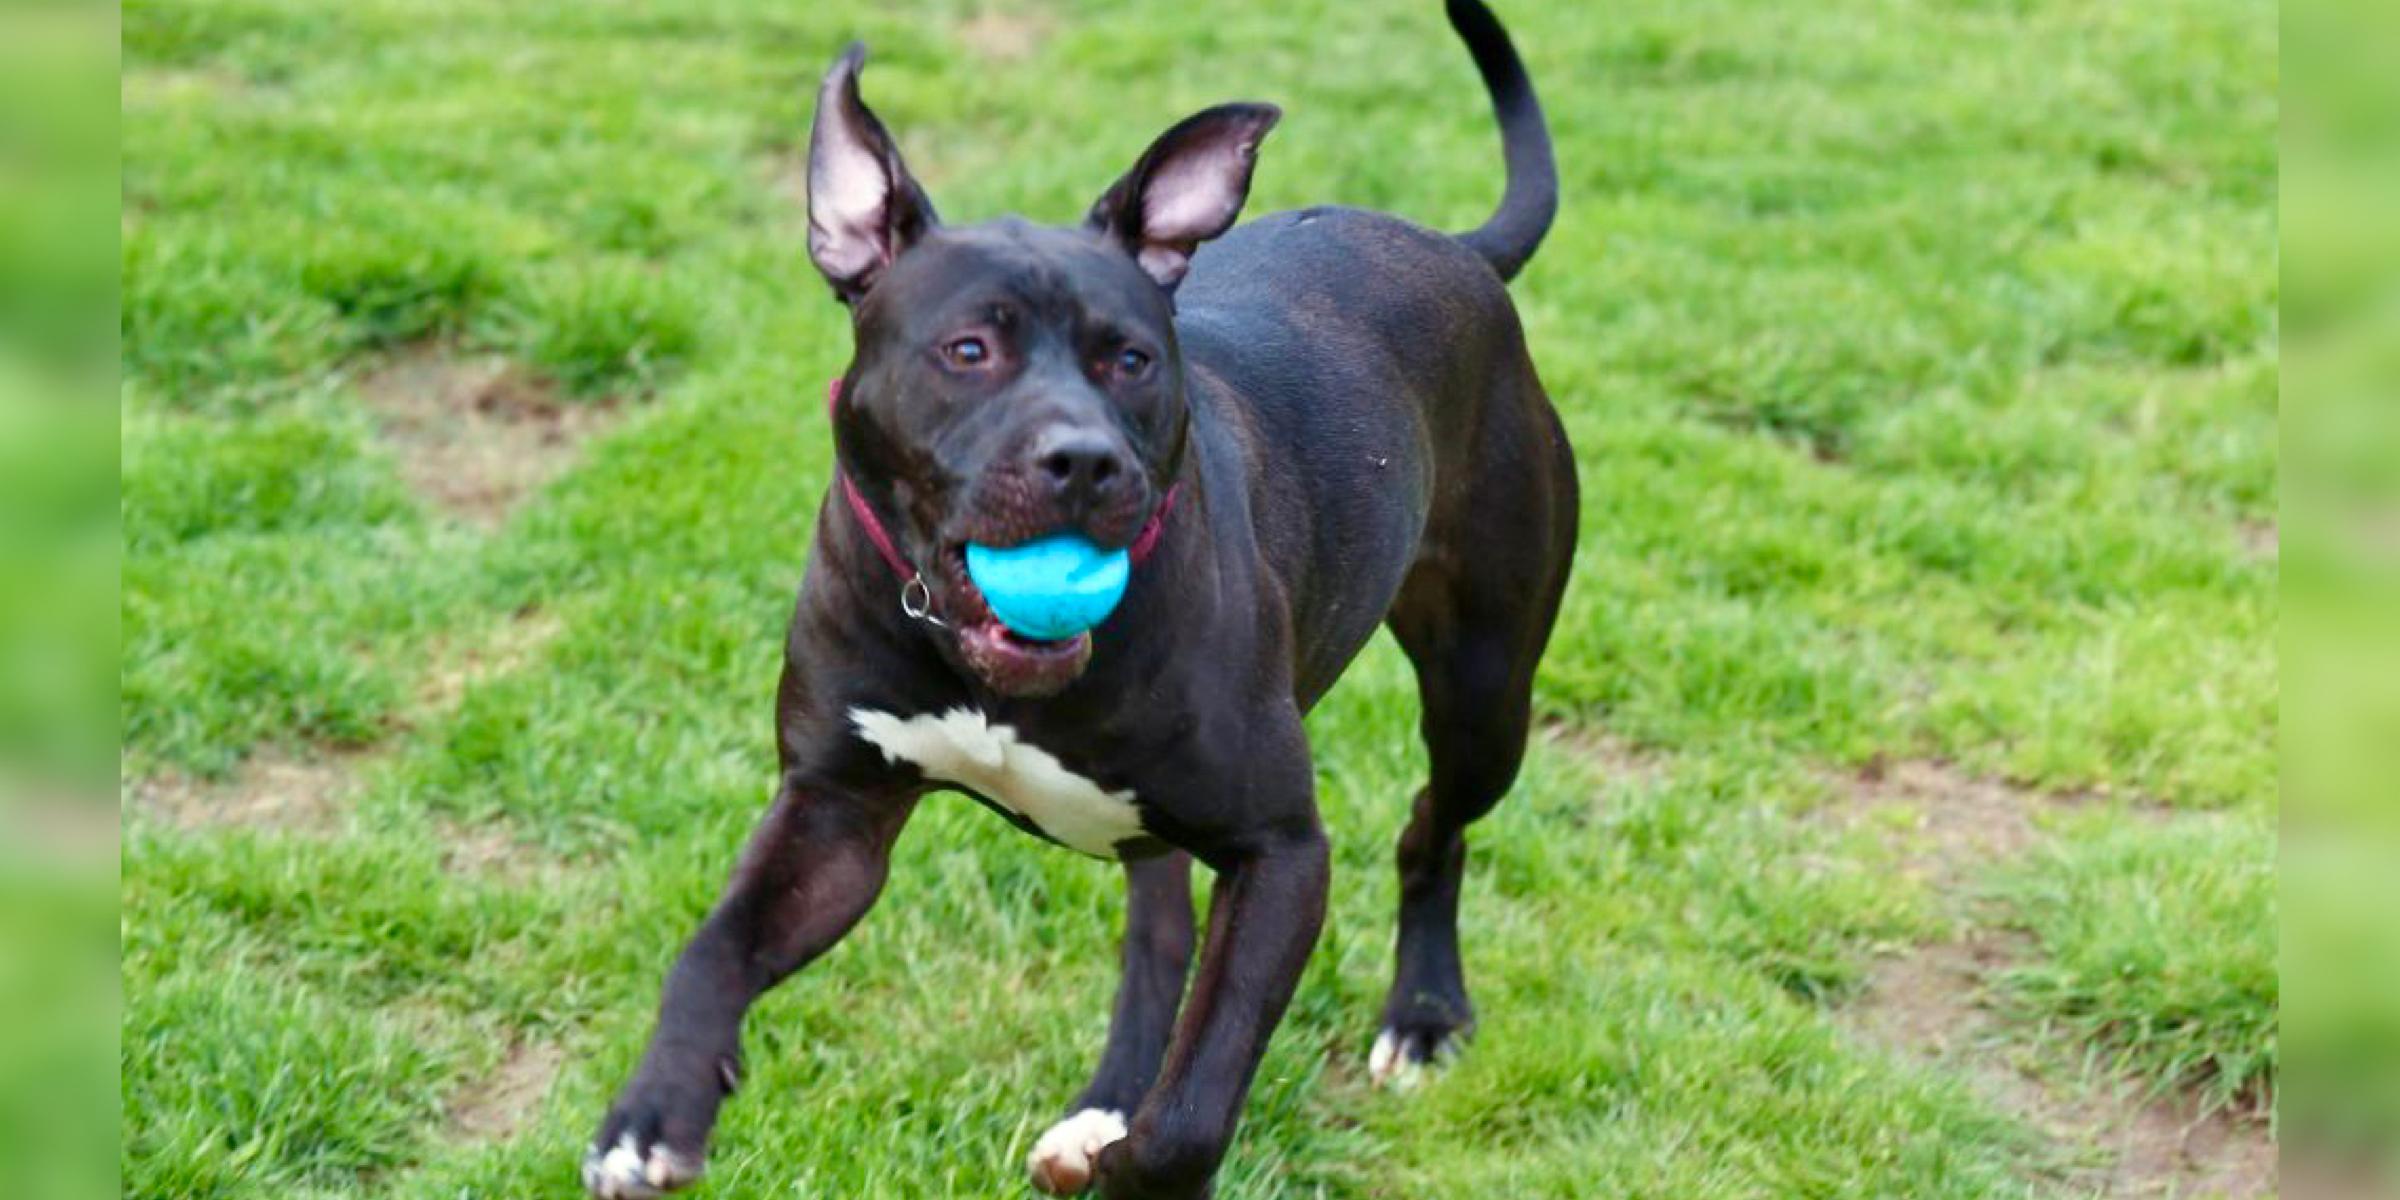 Tyson, black male pit bull